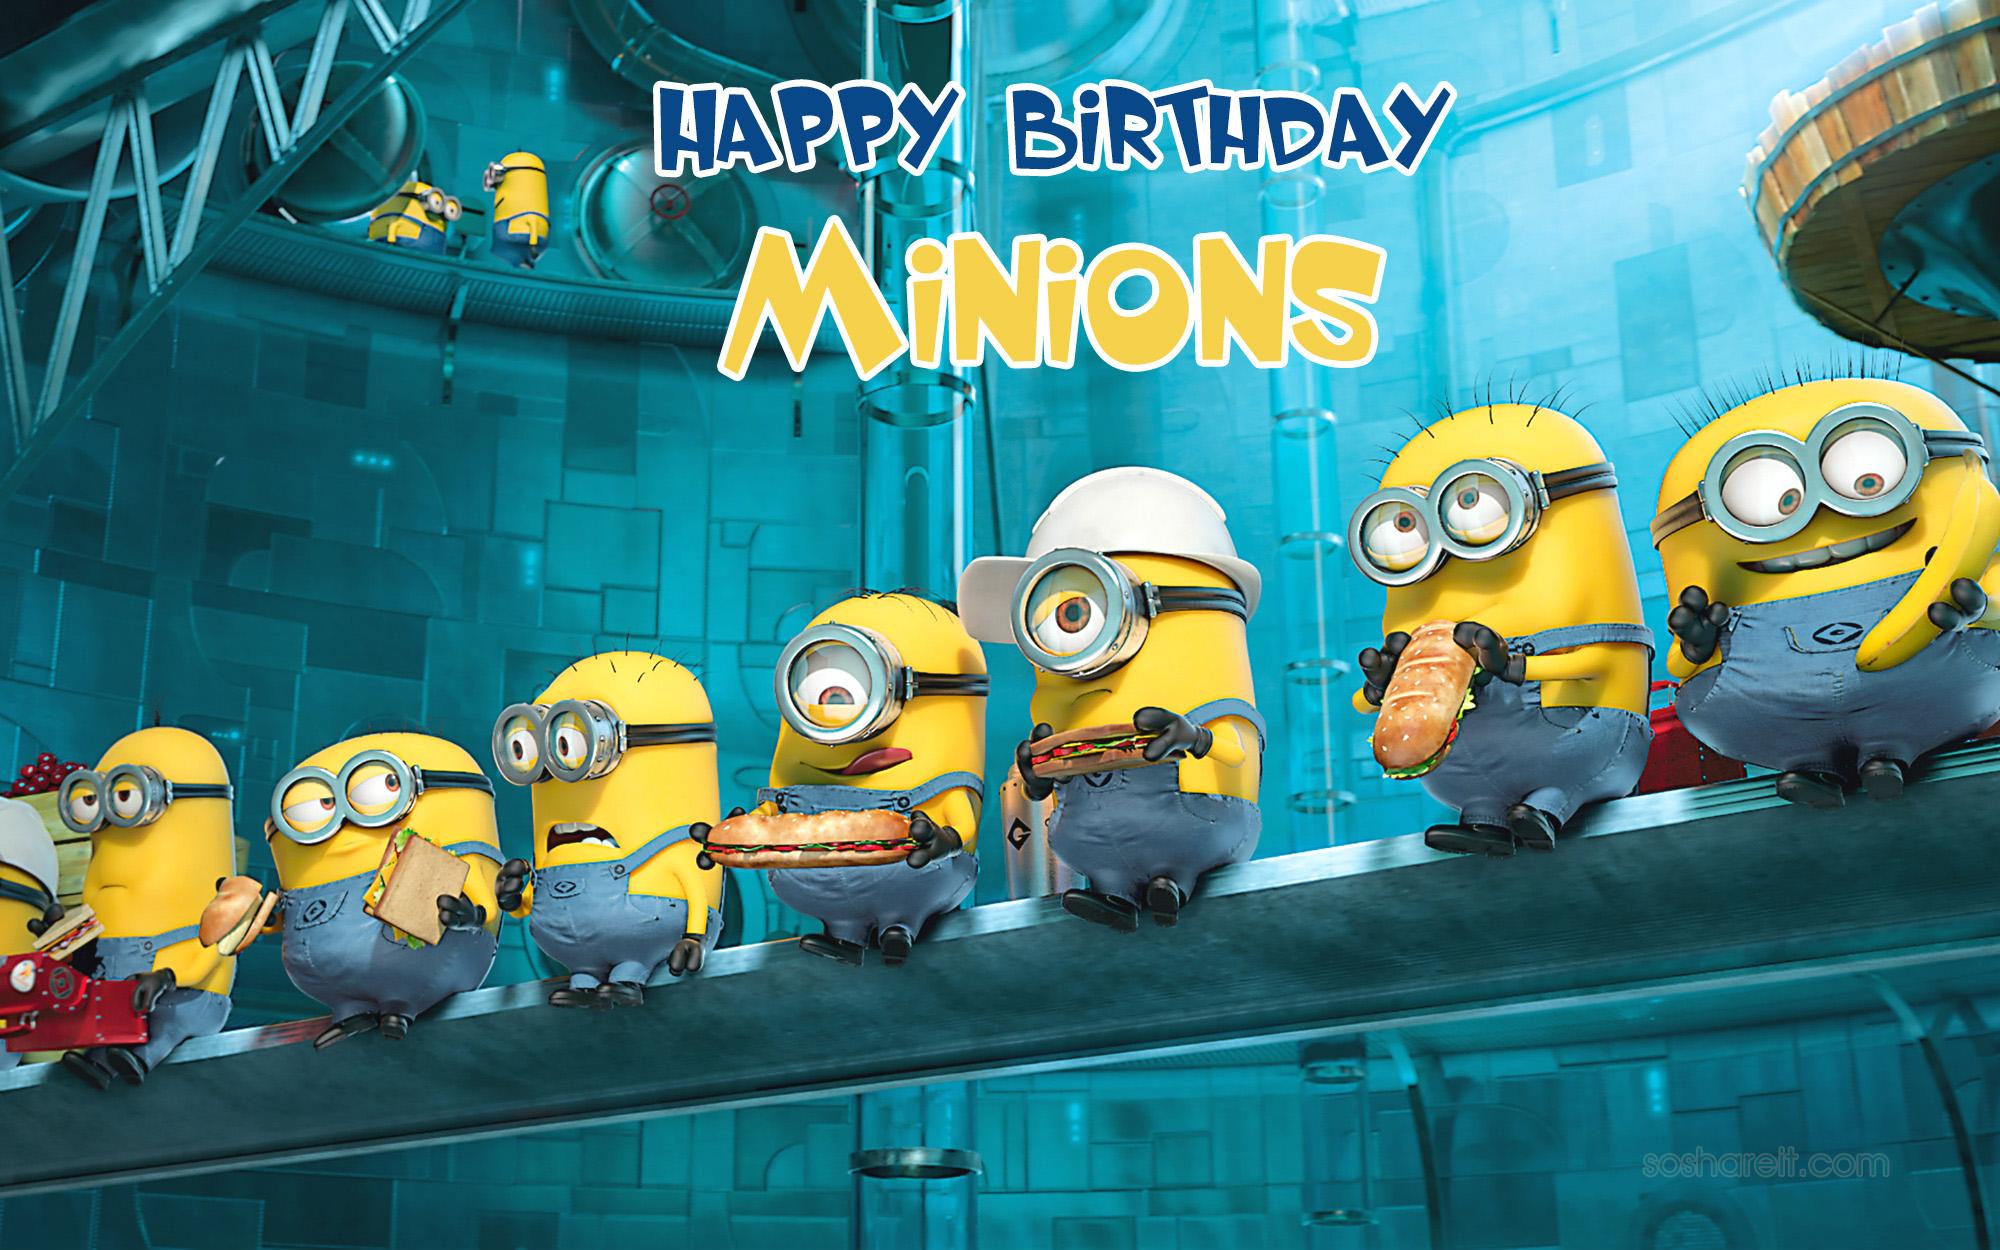 happy birthday minions wishes